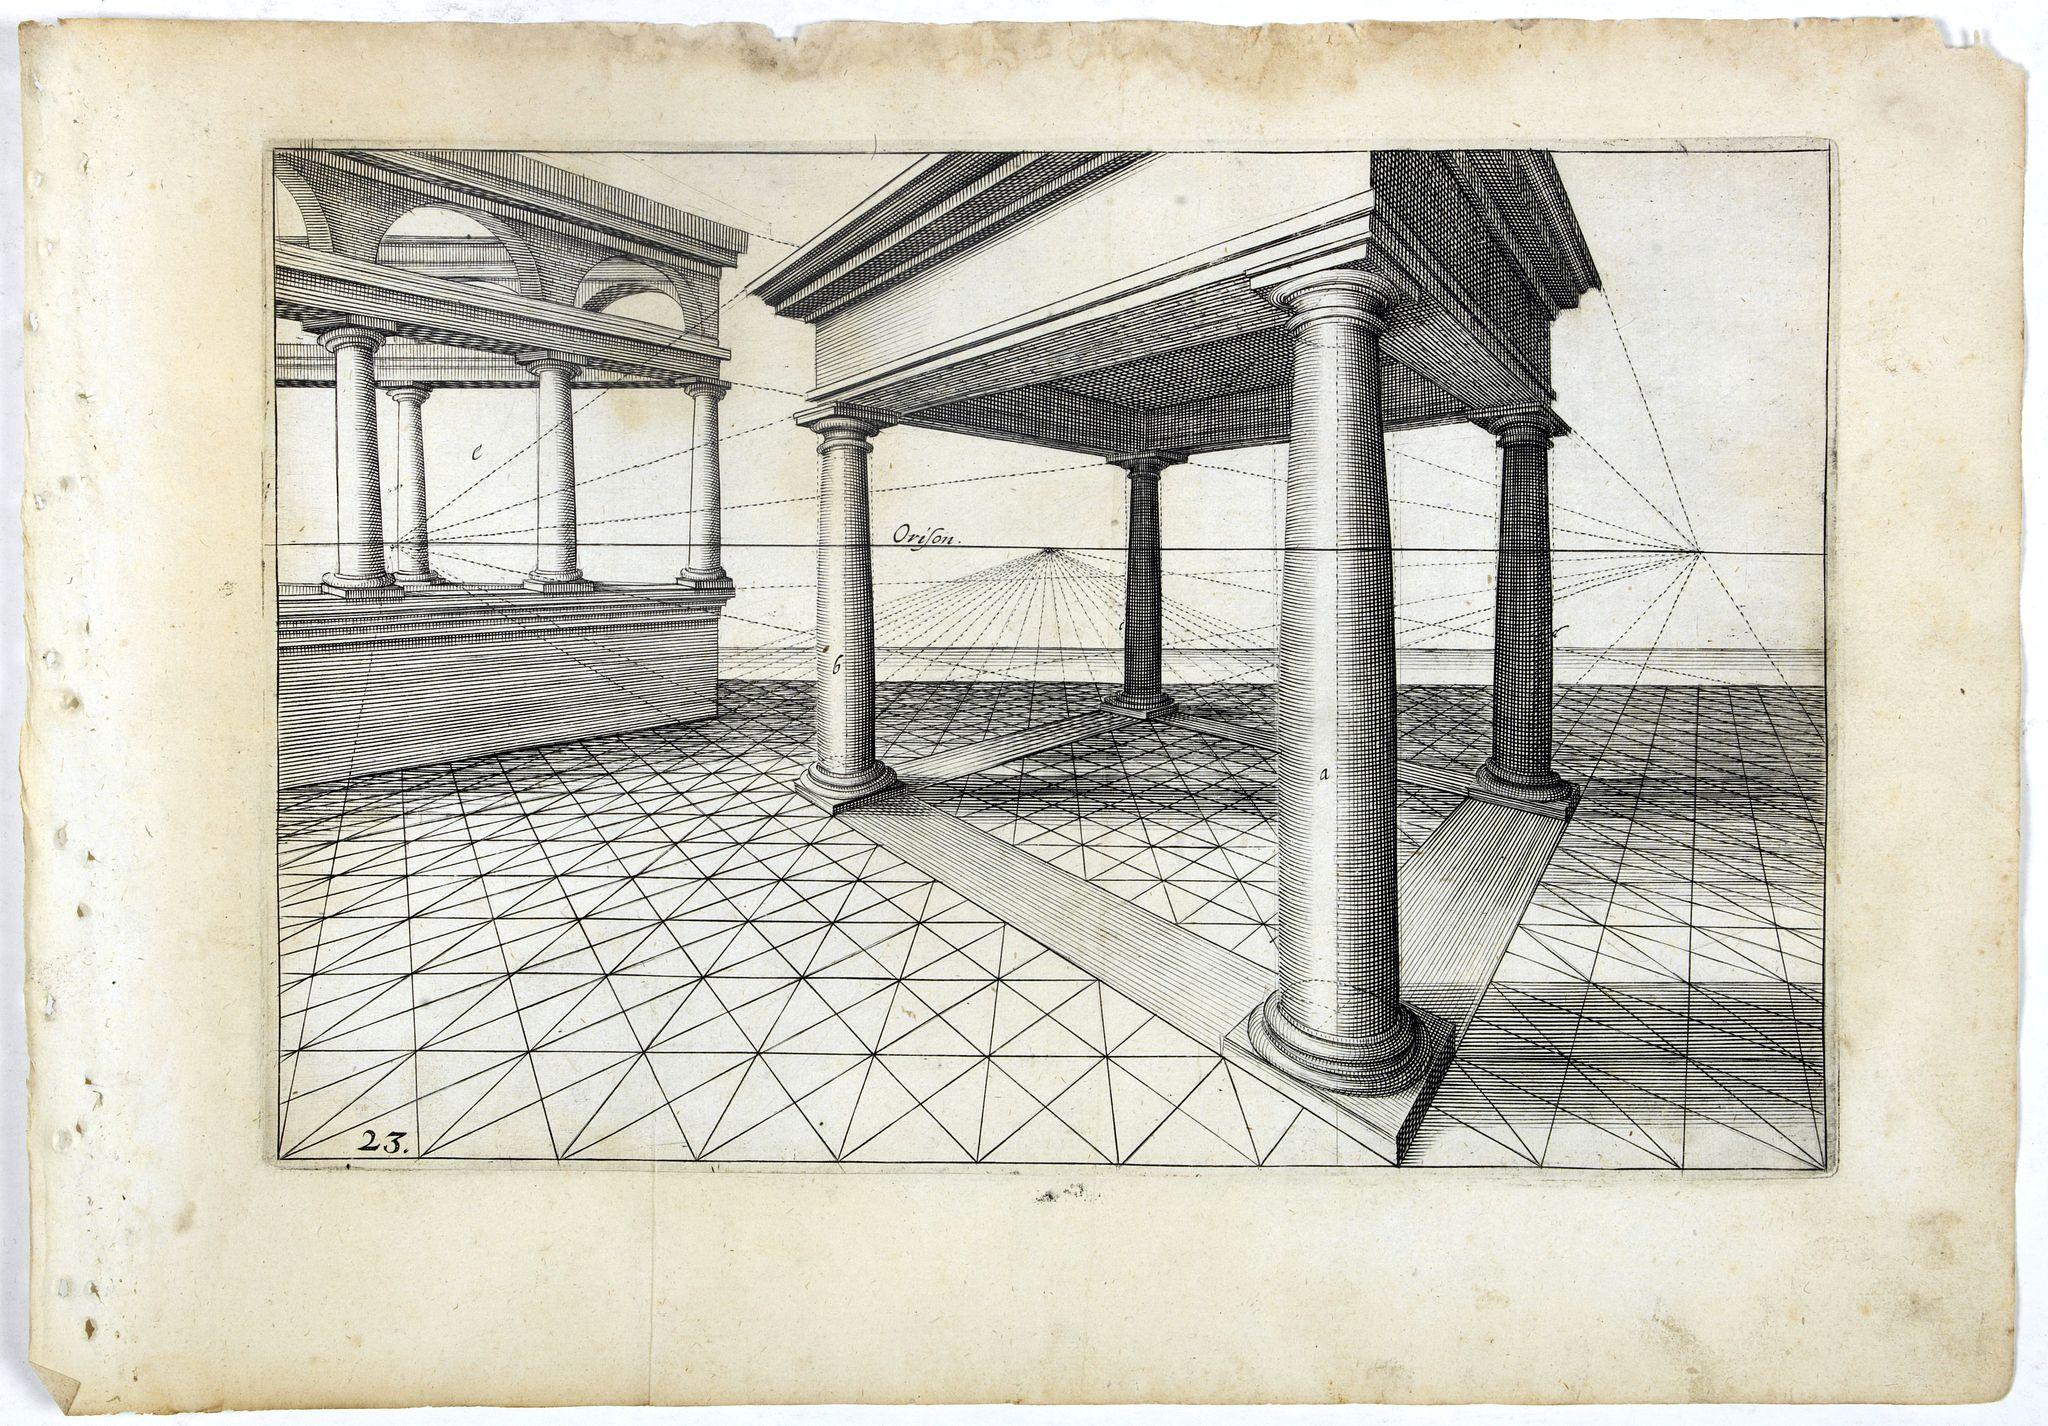 VREDEMAN DE VRIES, J. / HONDIUS, H. -  Perspective print by Vredeman de Vries. 23.